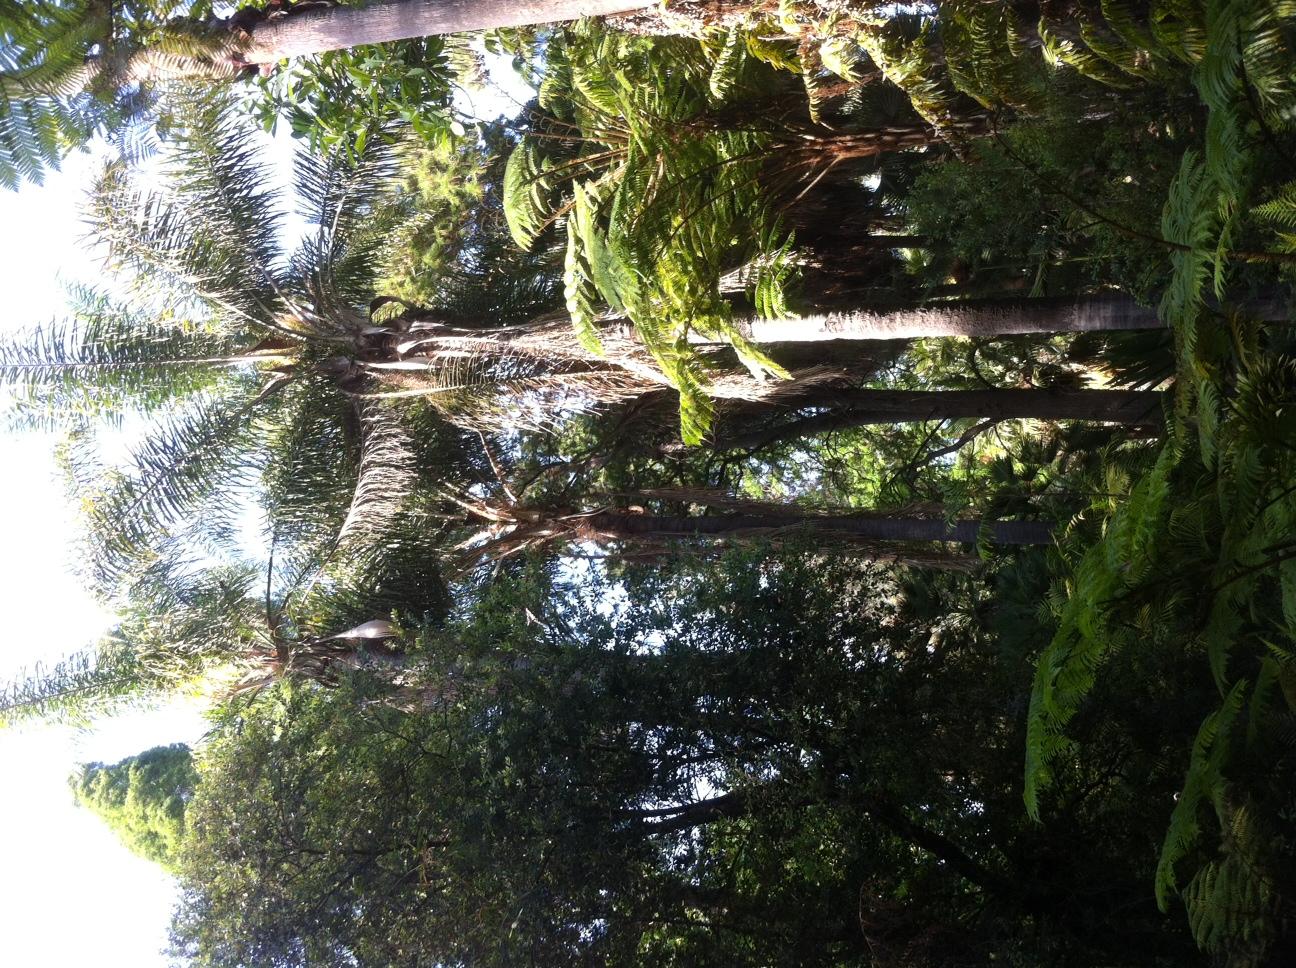 Etonnant File:Mildred E. Matthias Botanical Gardens 05.JPG